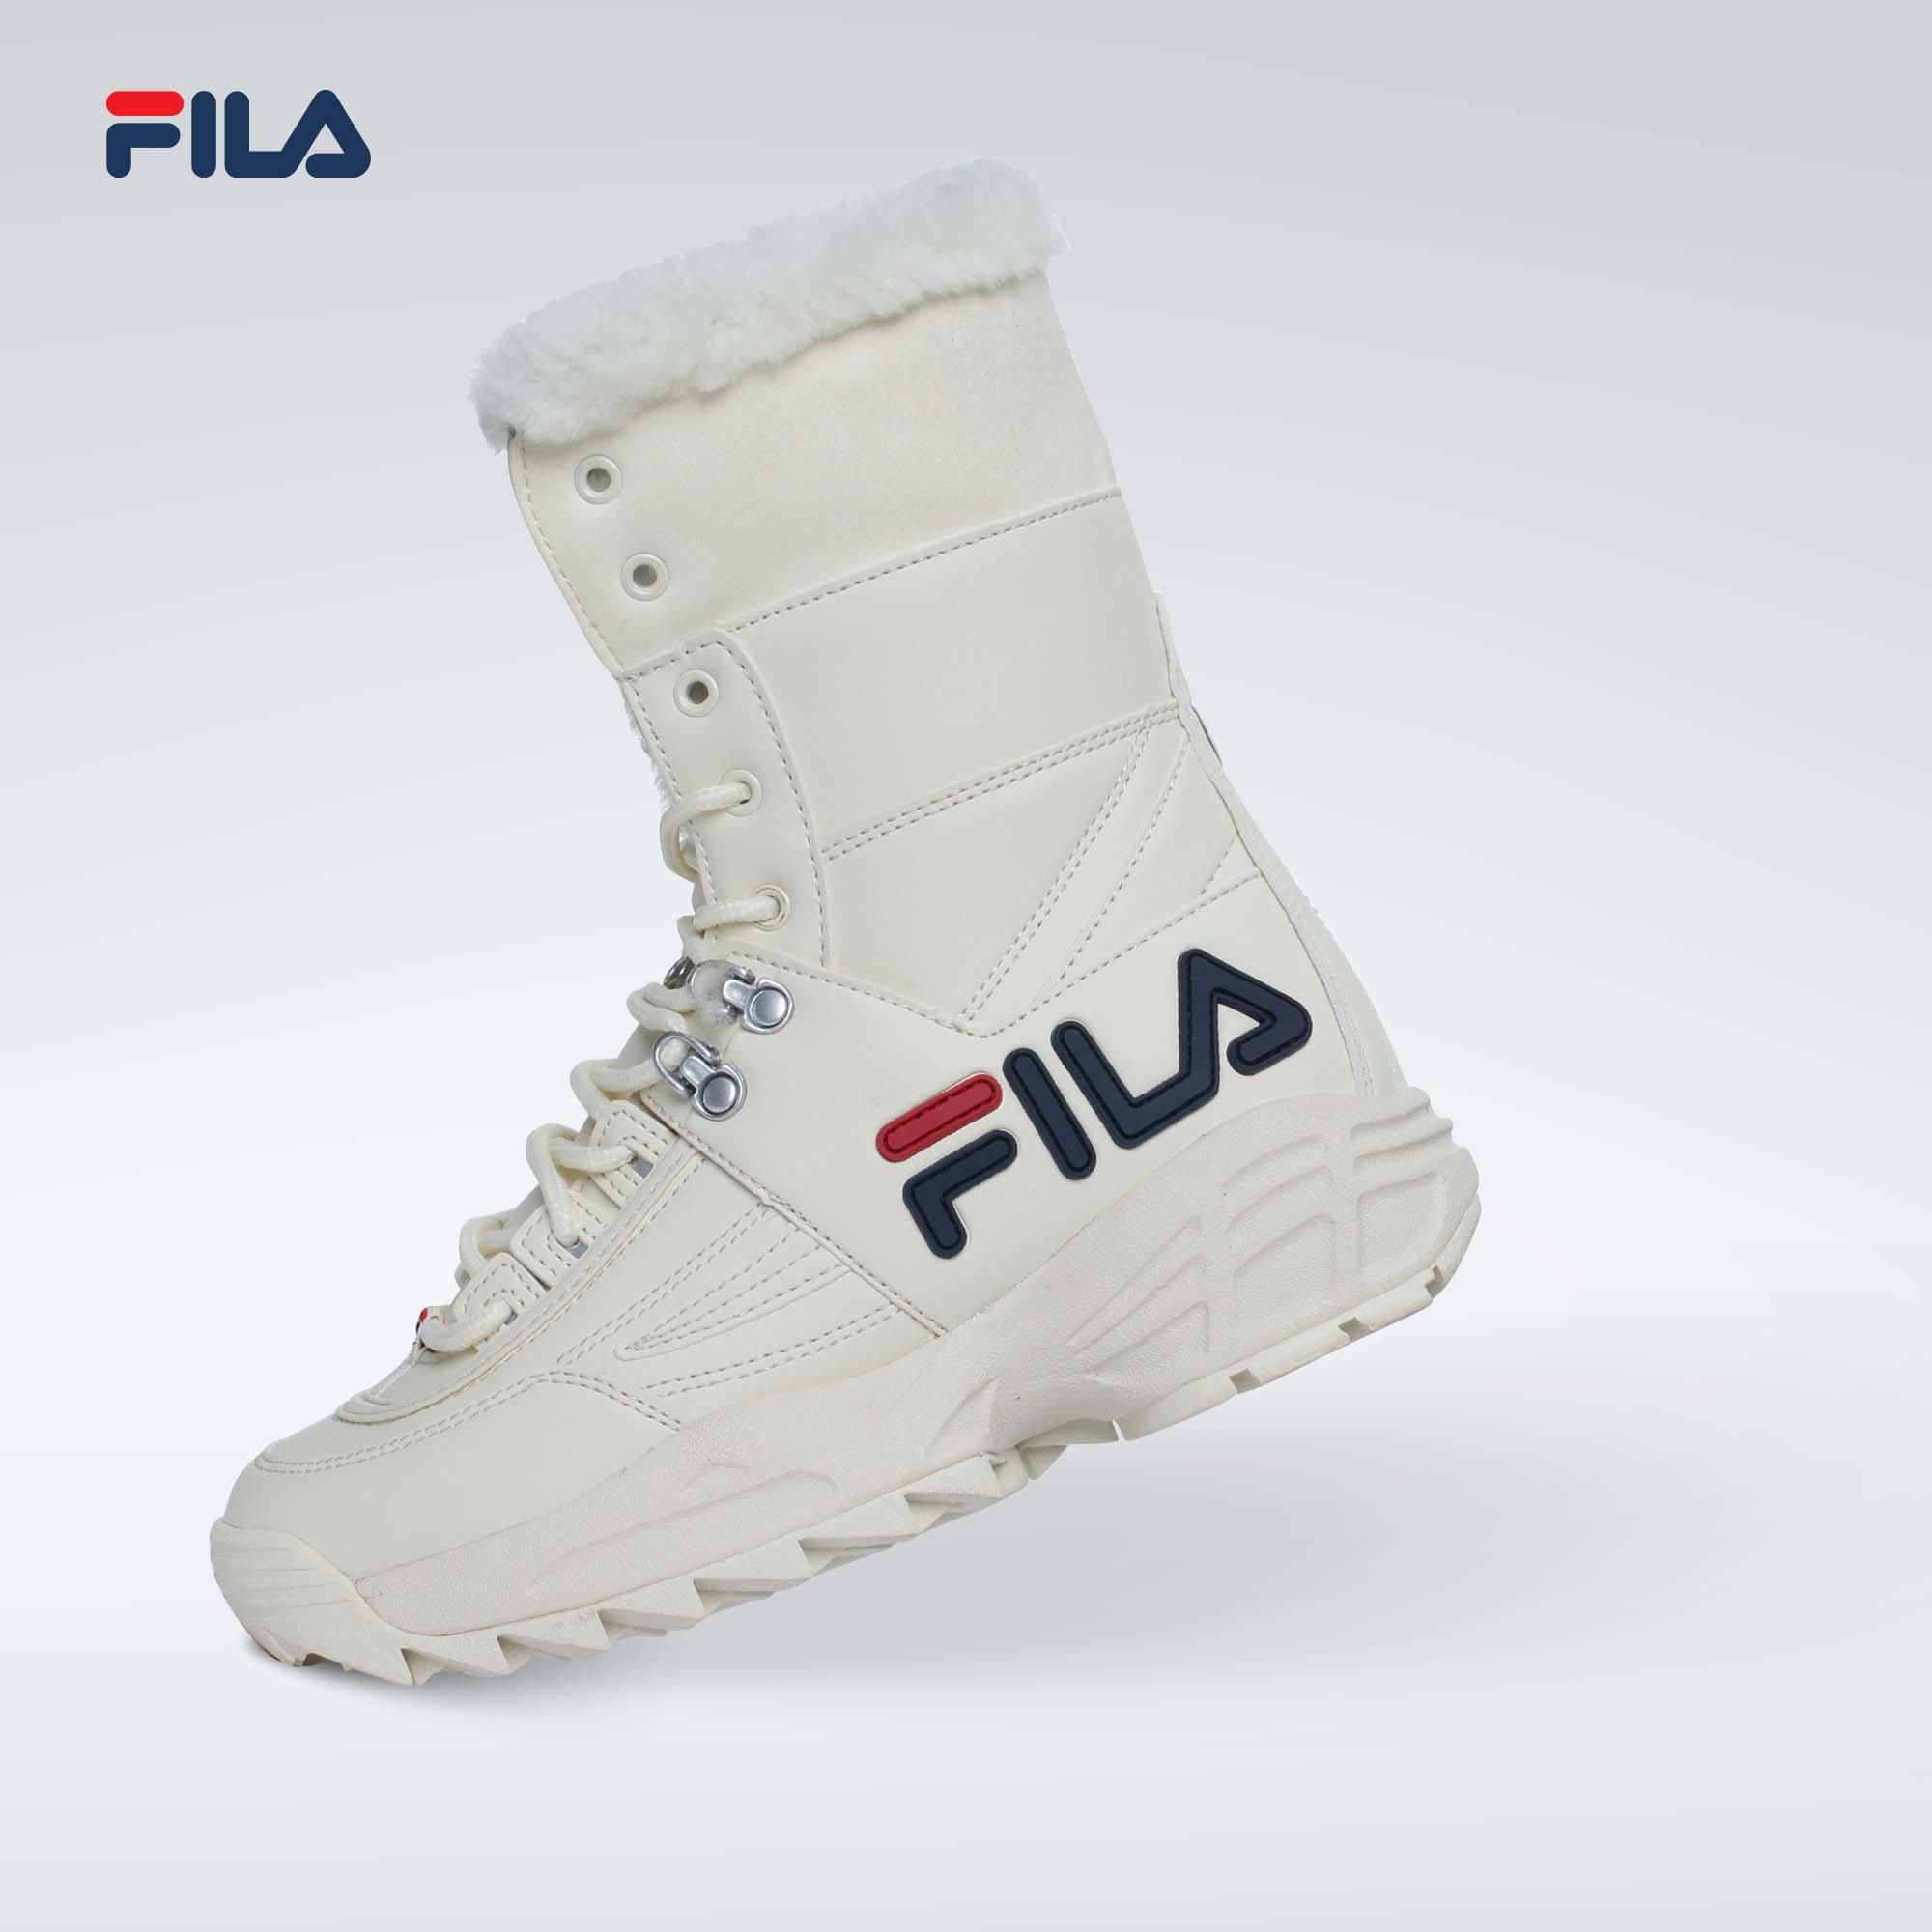 Fila Women's Disruptor Boot 125: Buy